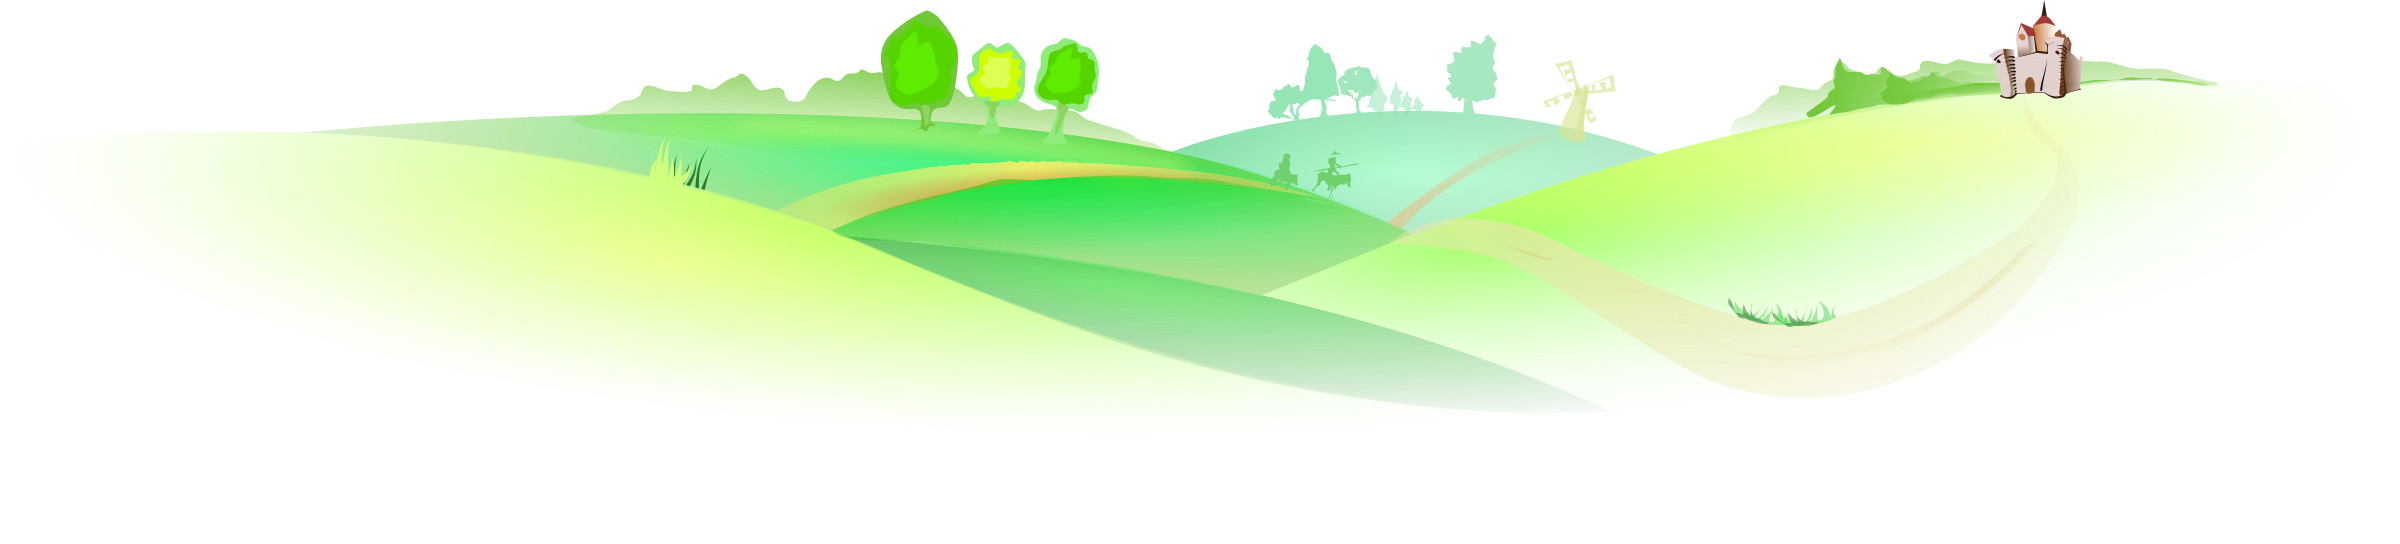 Ground clipart scenery. Landscape wallpapers kbyte v